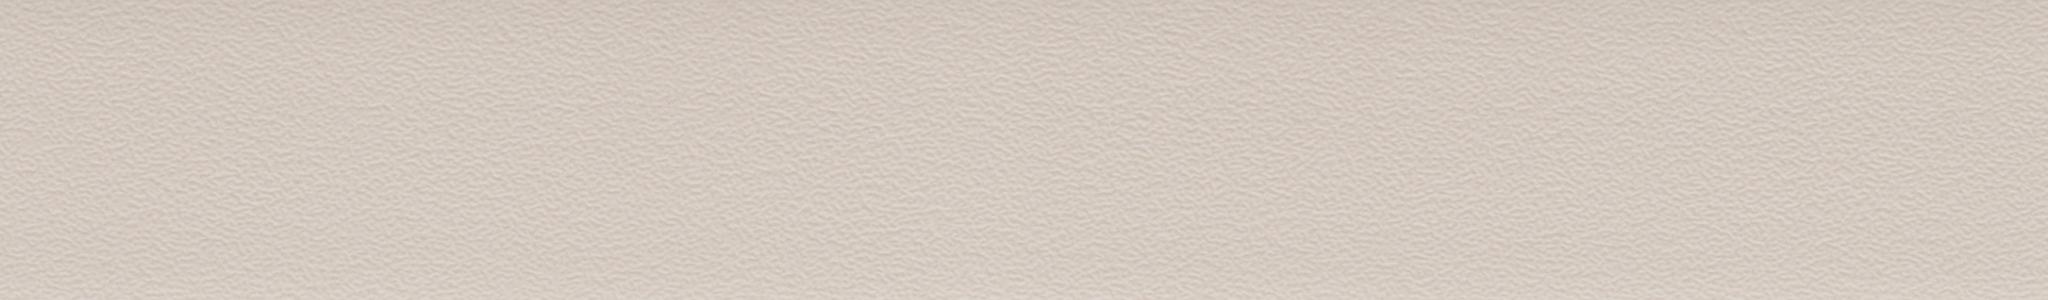 HU 187165 ABS hrana hnědá perla 101